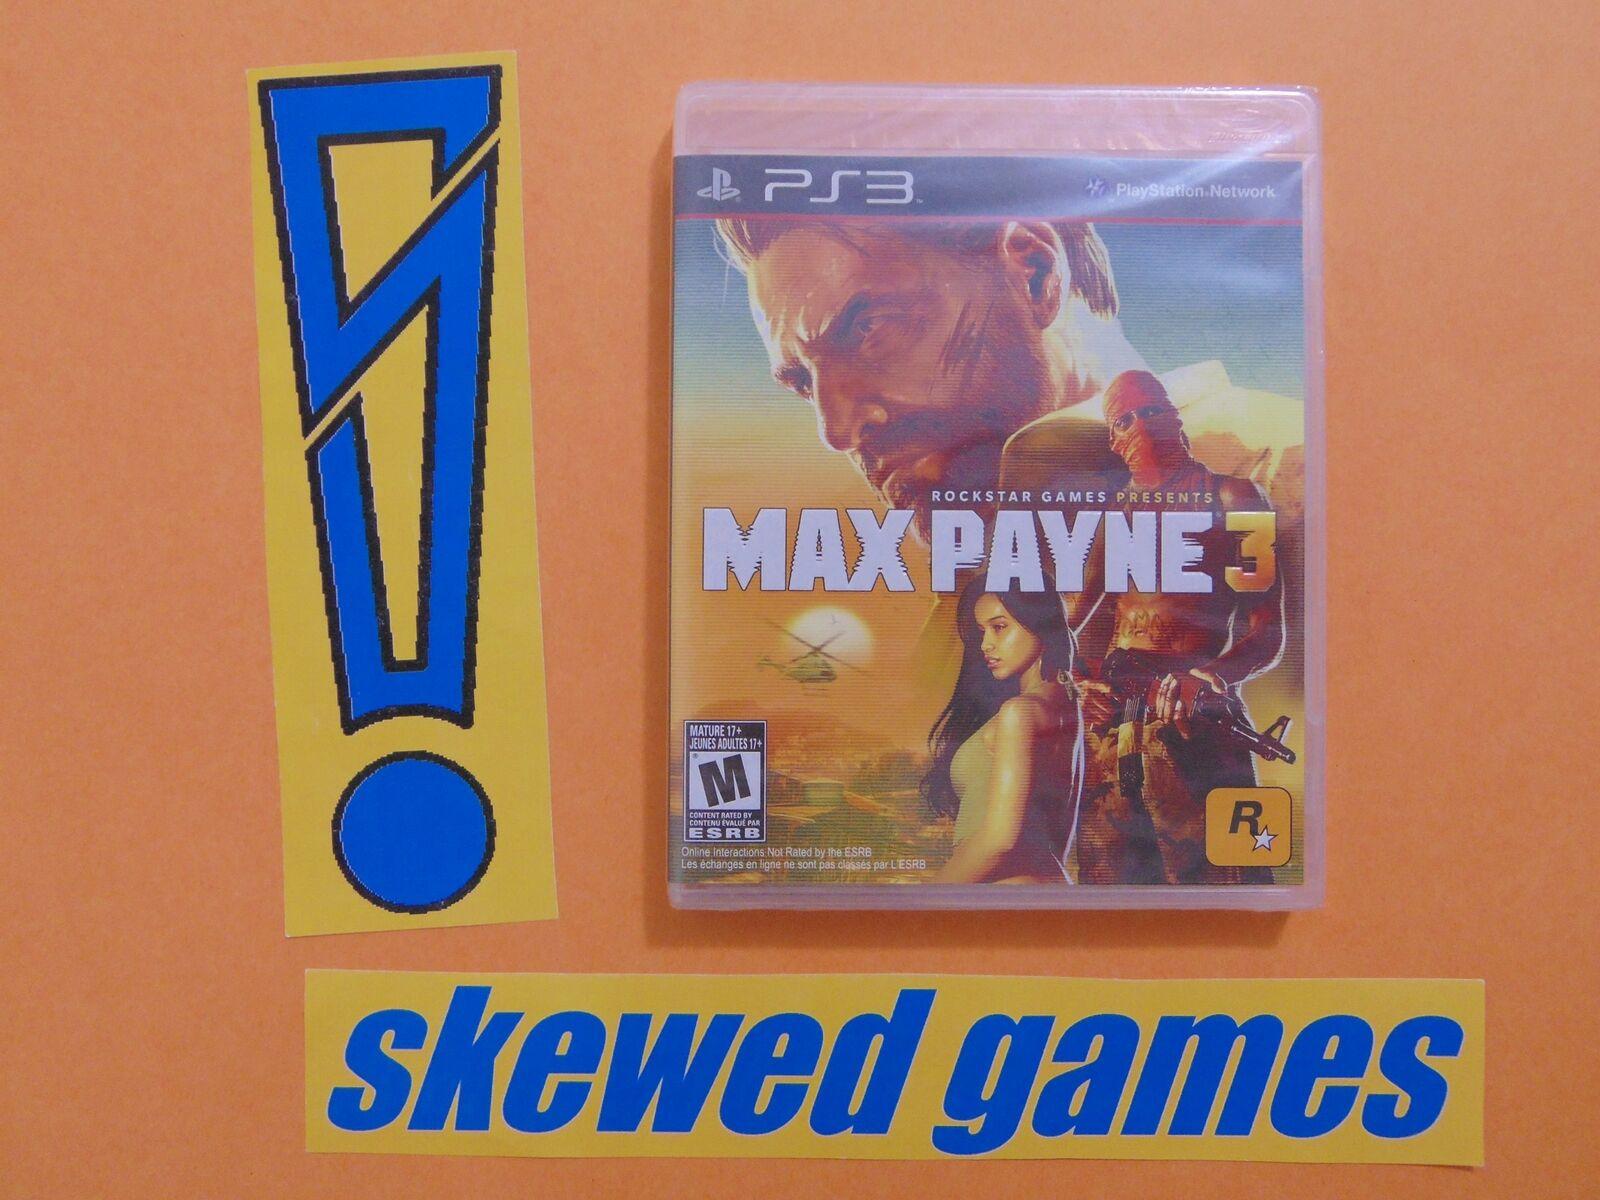 Max Payne 3 matchmaking problem